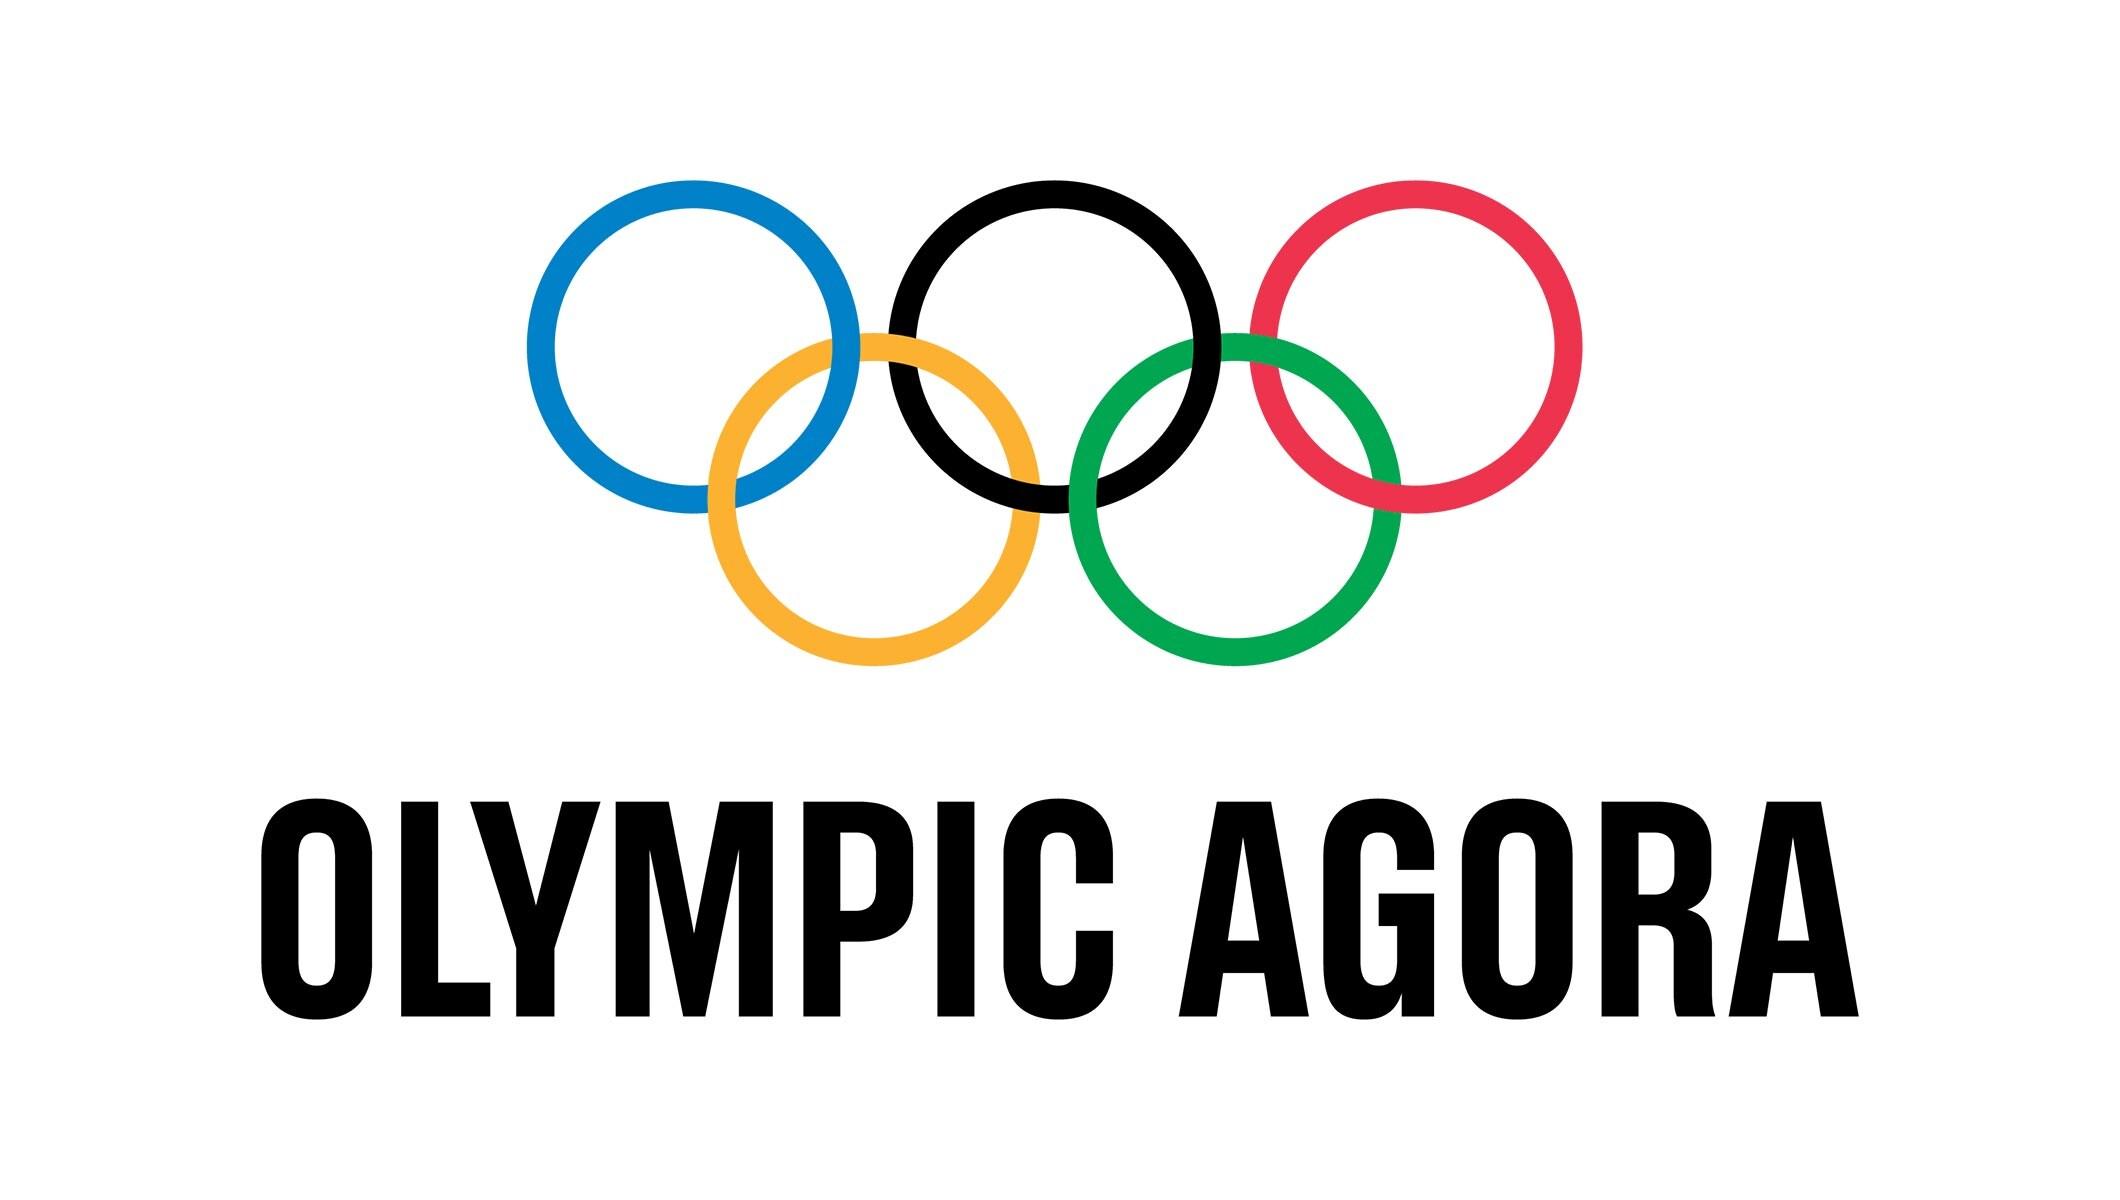 Olympic Agora logo